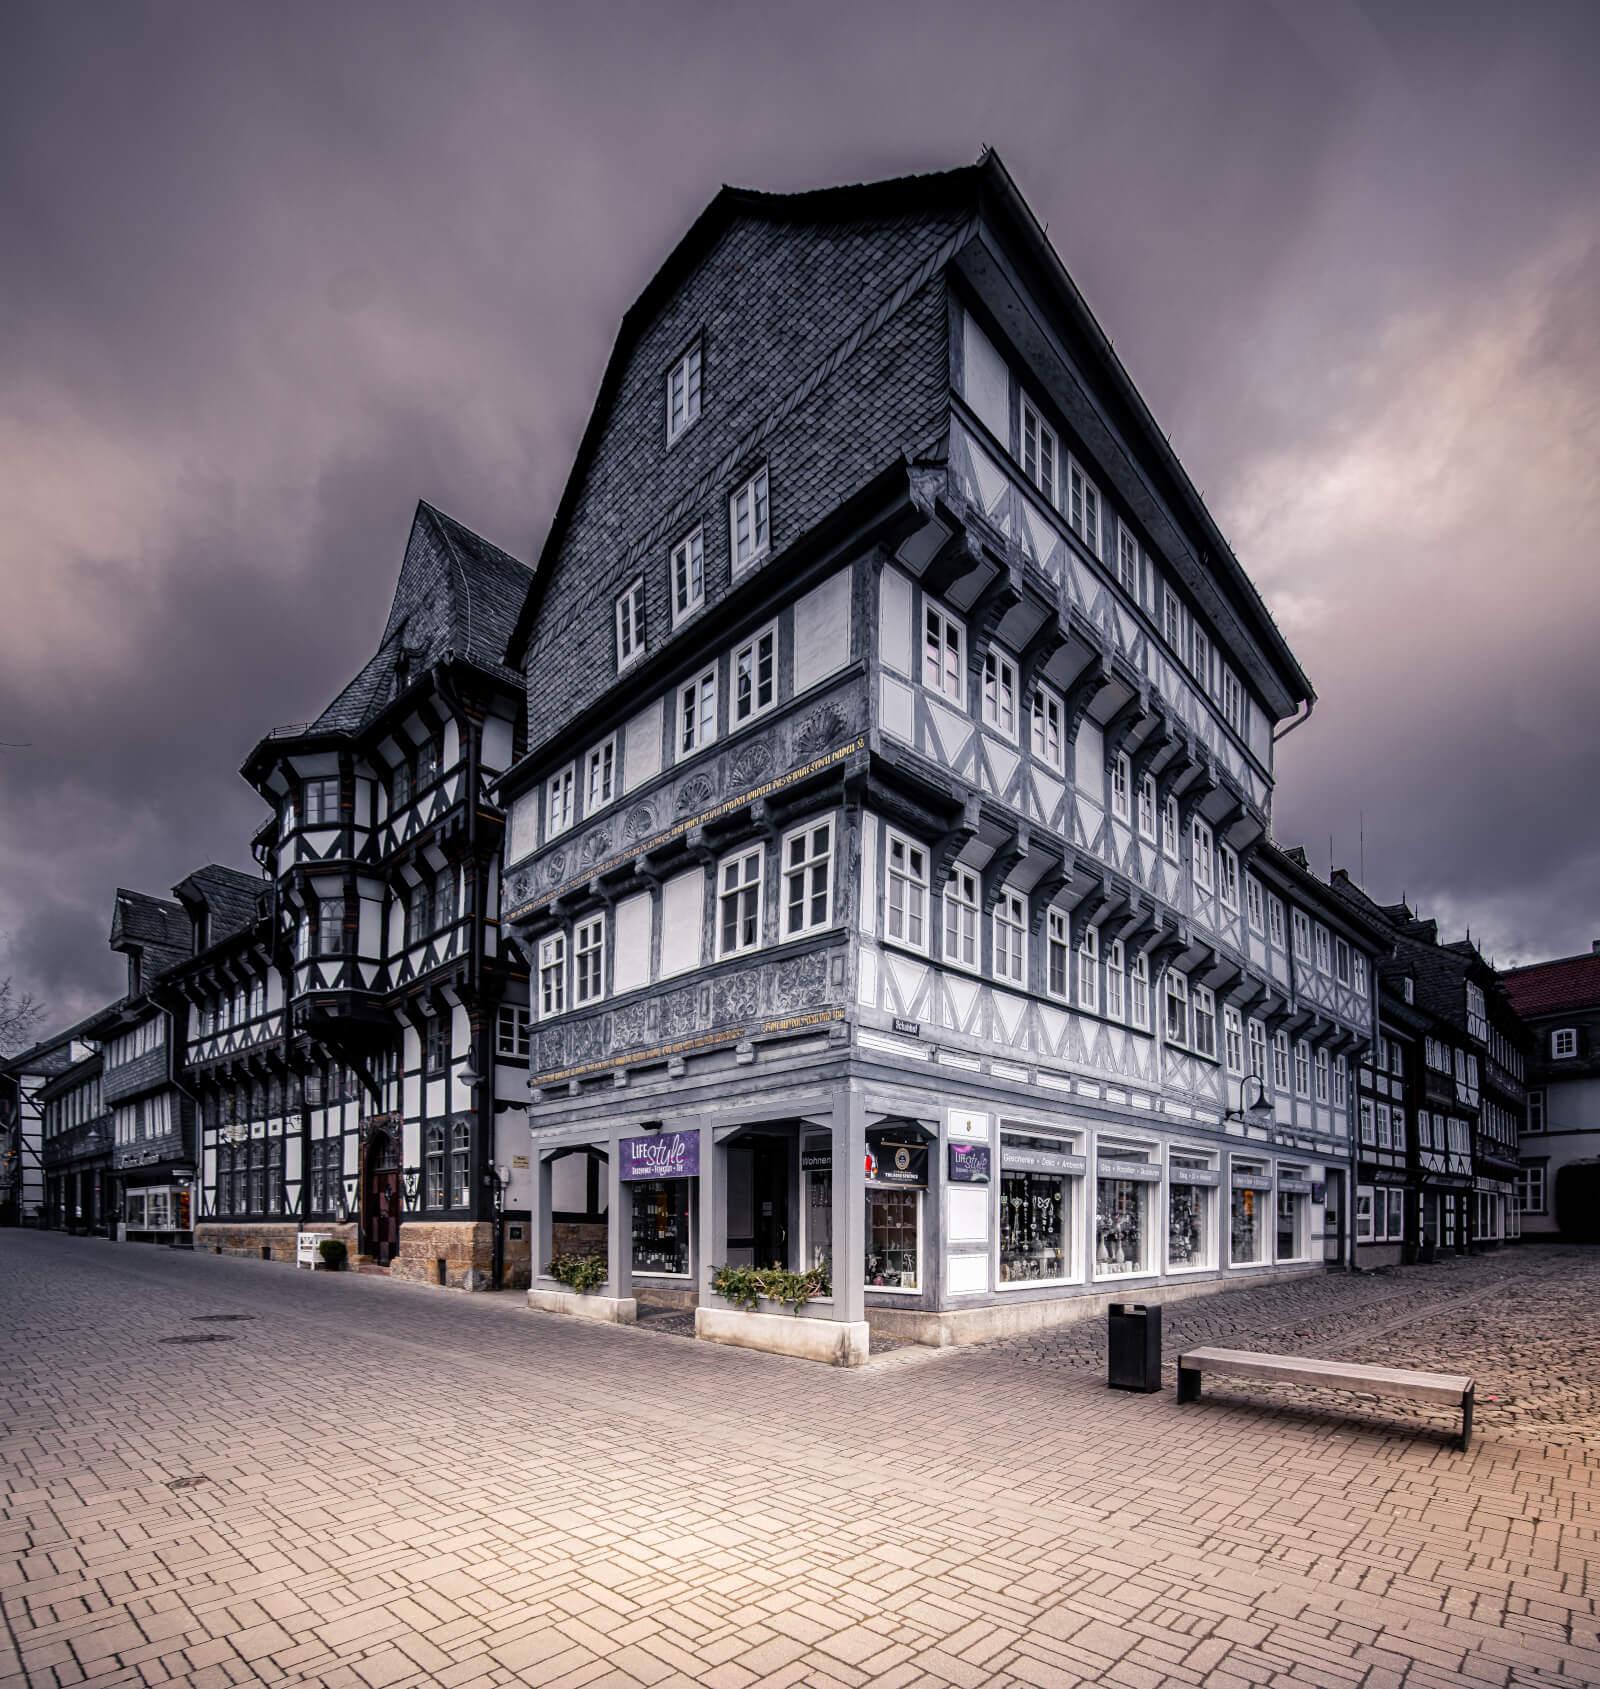 LIFEstyle-Goslar-Schuhhof-8-Shop-ok